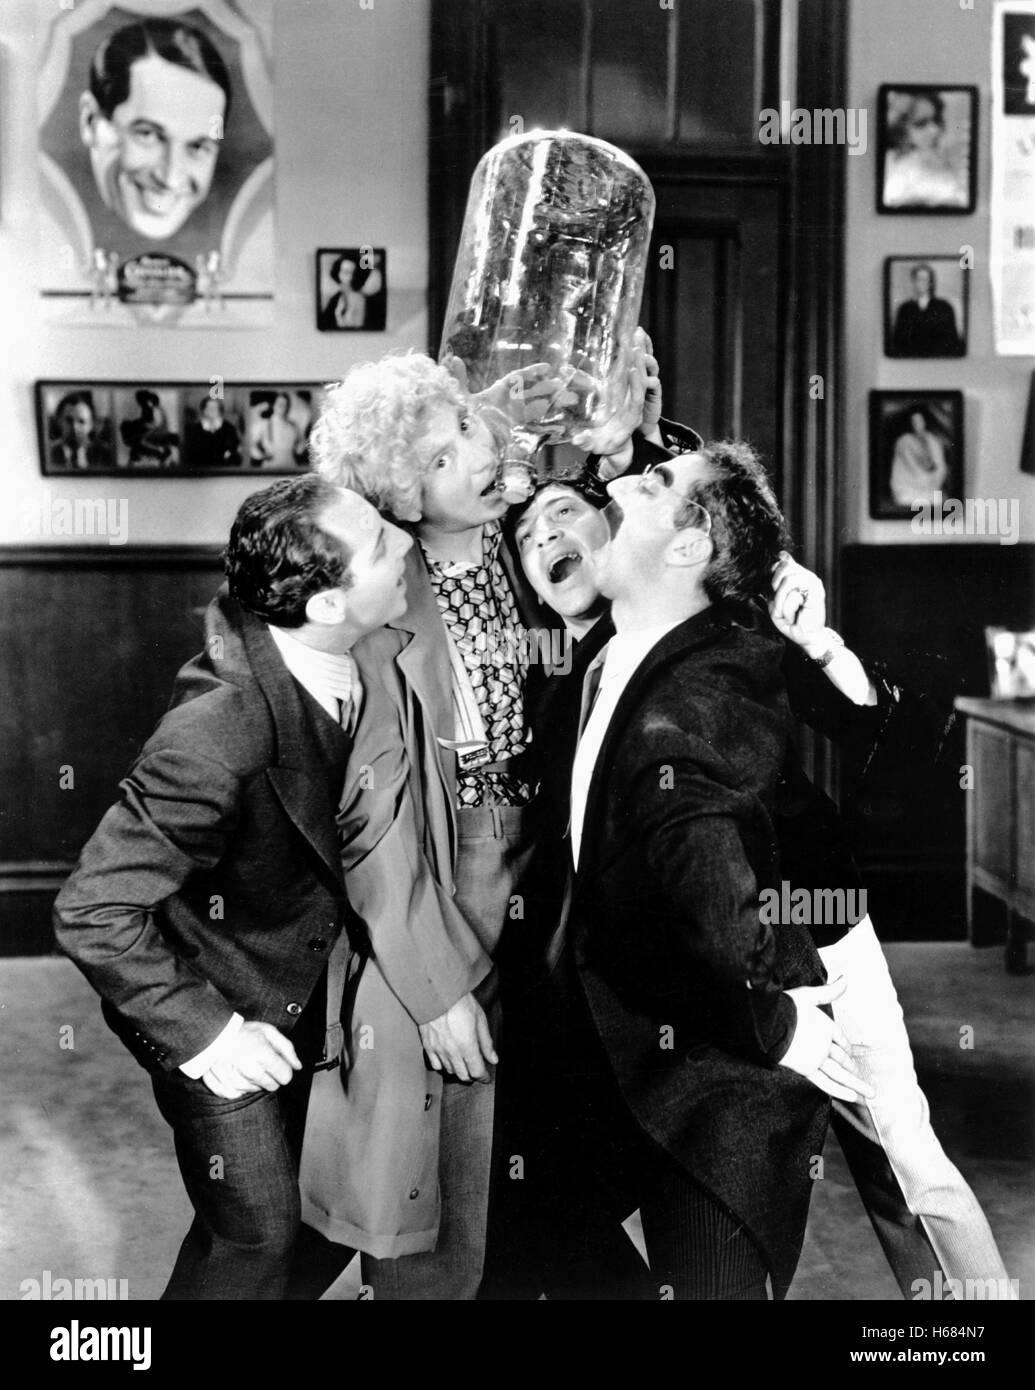 Zeppo Marx Harpo Marx Chico Marx Groucho Marx Das Cocoanuts 1929